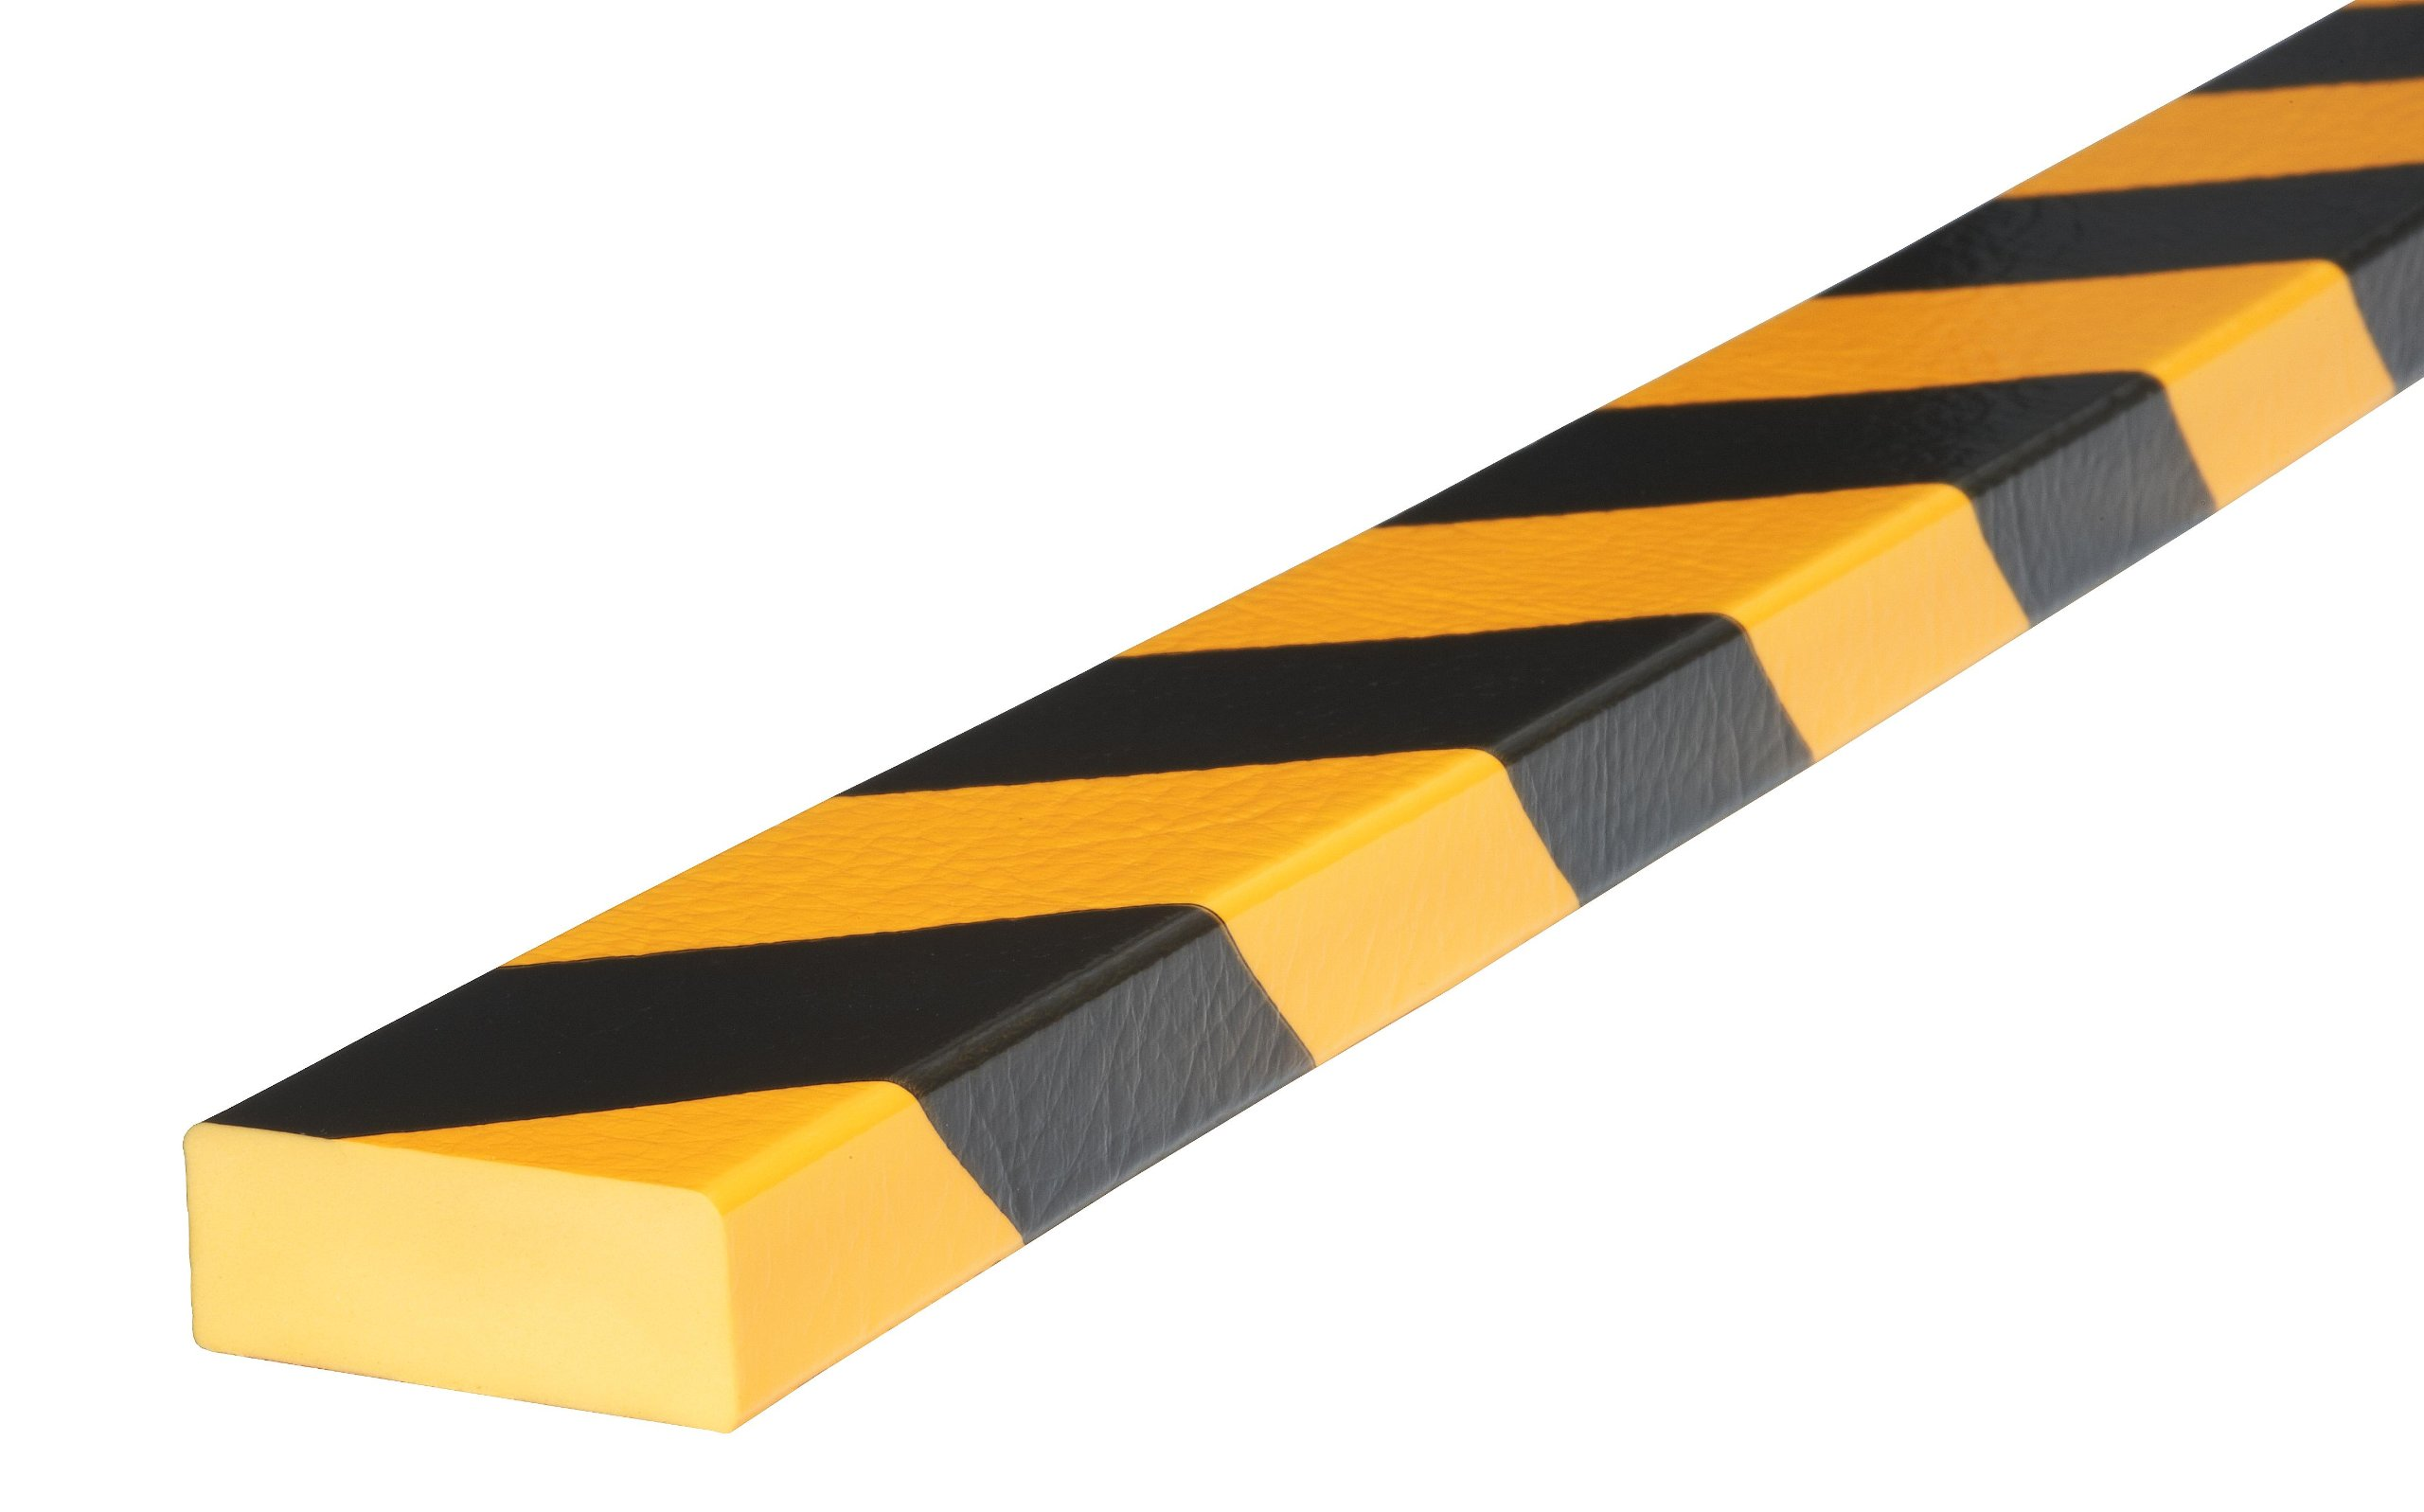 IRONguard 60-6732 Knuffi Model D Surface Bumper Guard Black/Yellow 1M